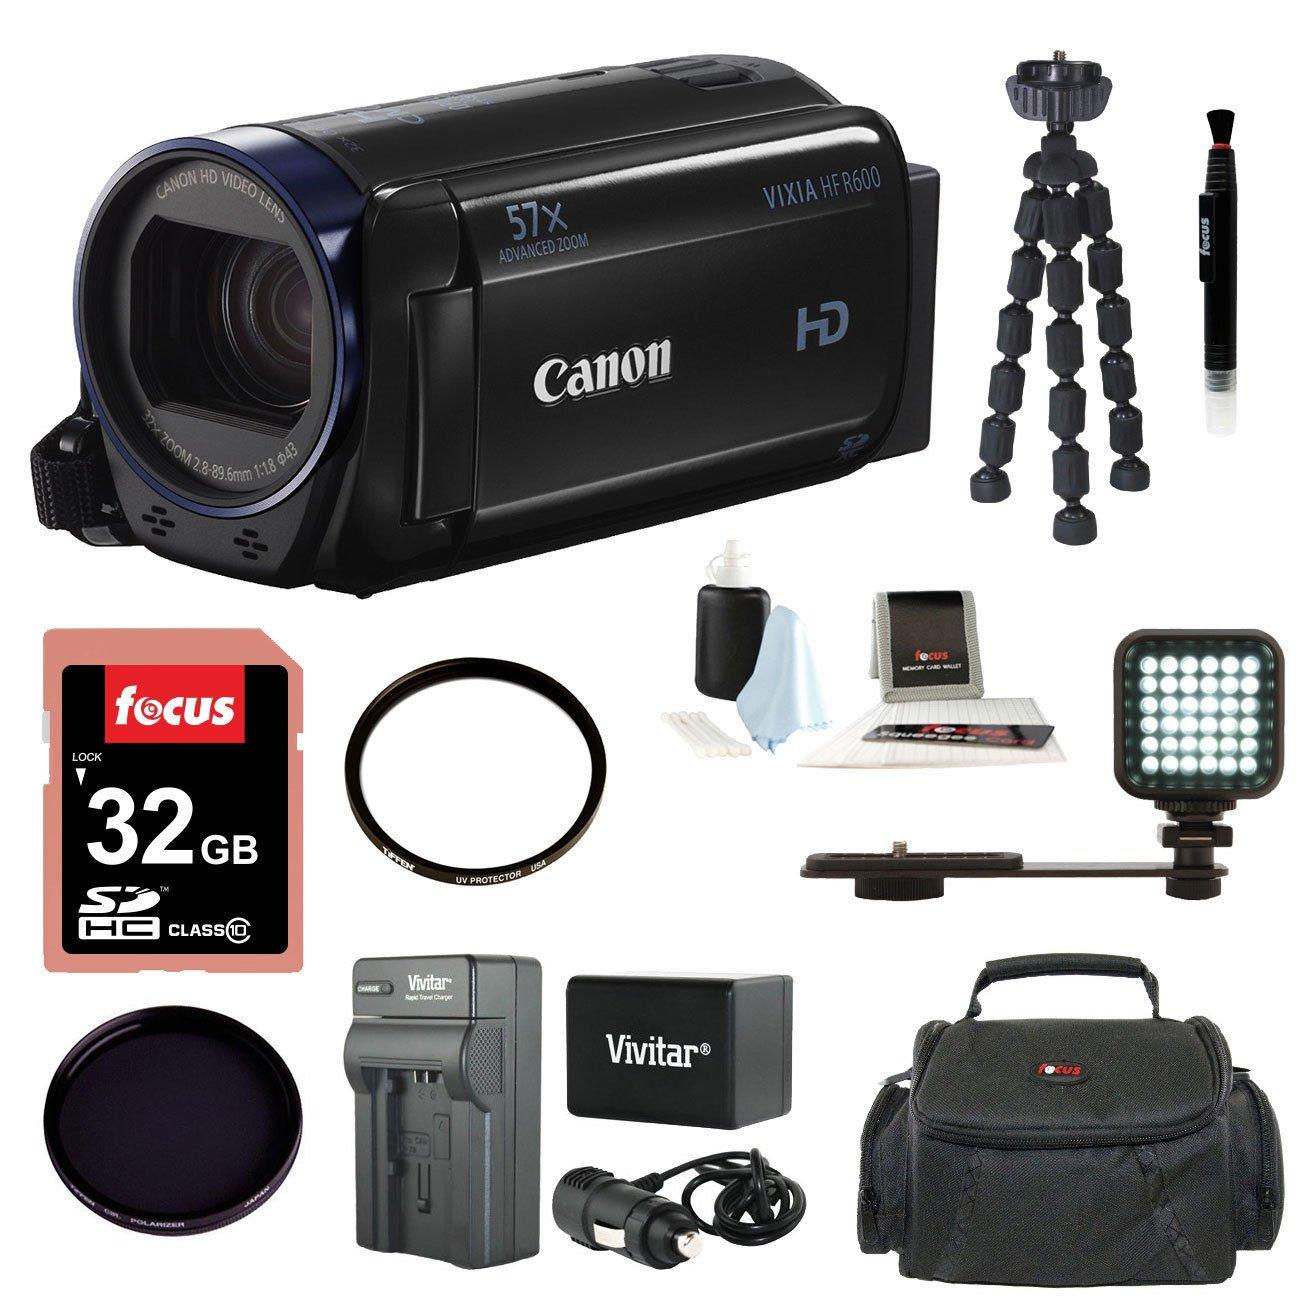 Brand New Canon Vixia HF R600 Camcorder (Black) with 64GB Deluxe Accessory Bundle